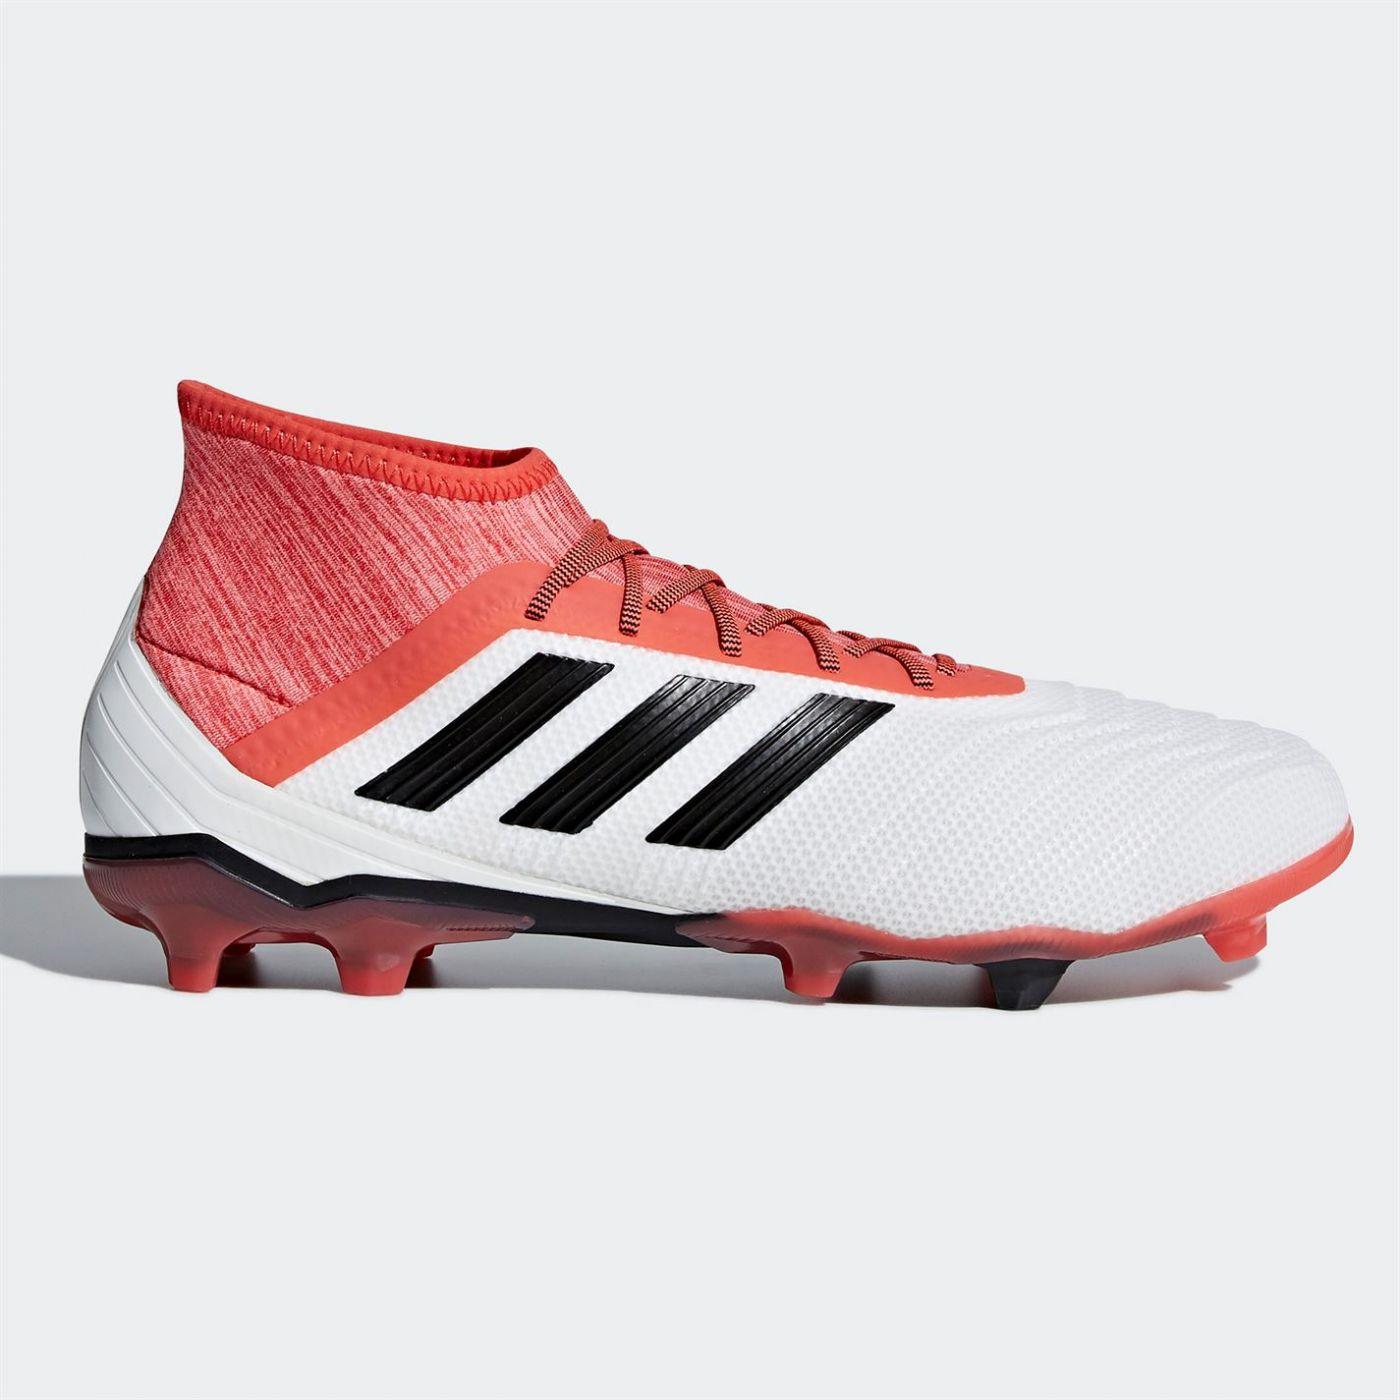 ba8721fa2532 Adidas Predator 18.2 Mens FG Football Boots - FACTCOOL